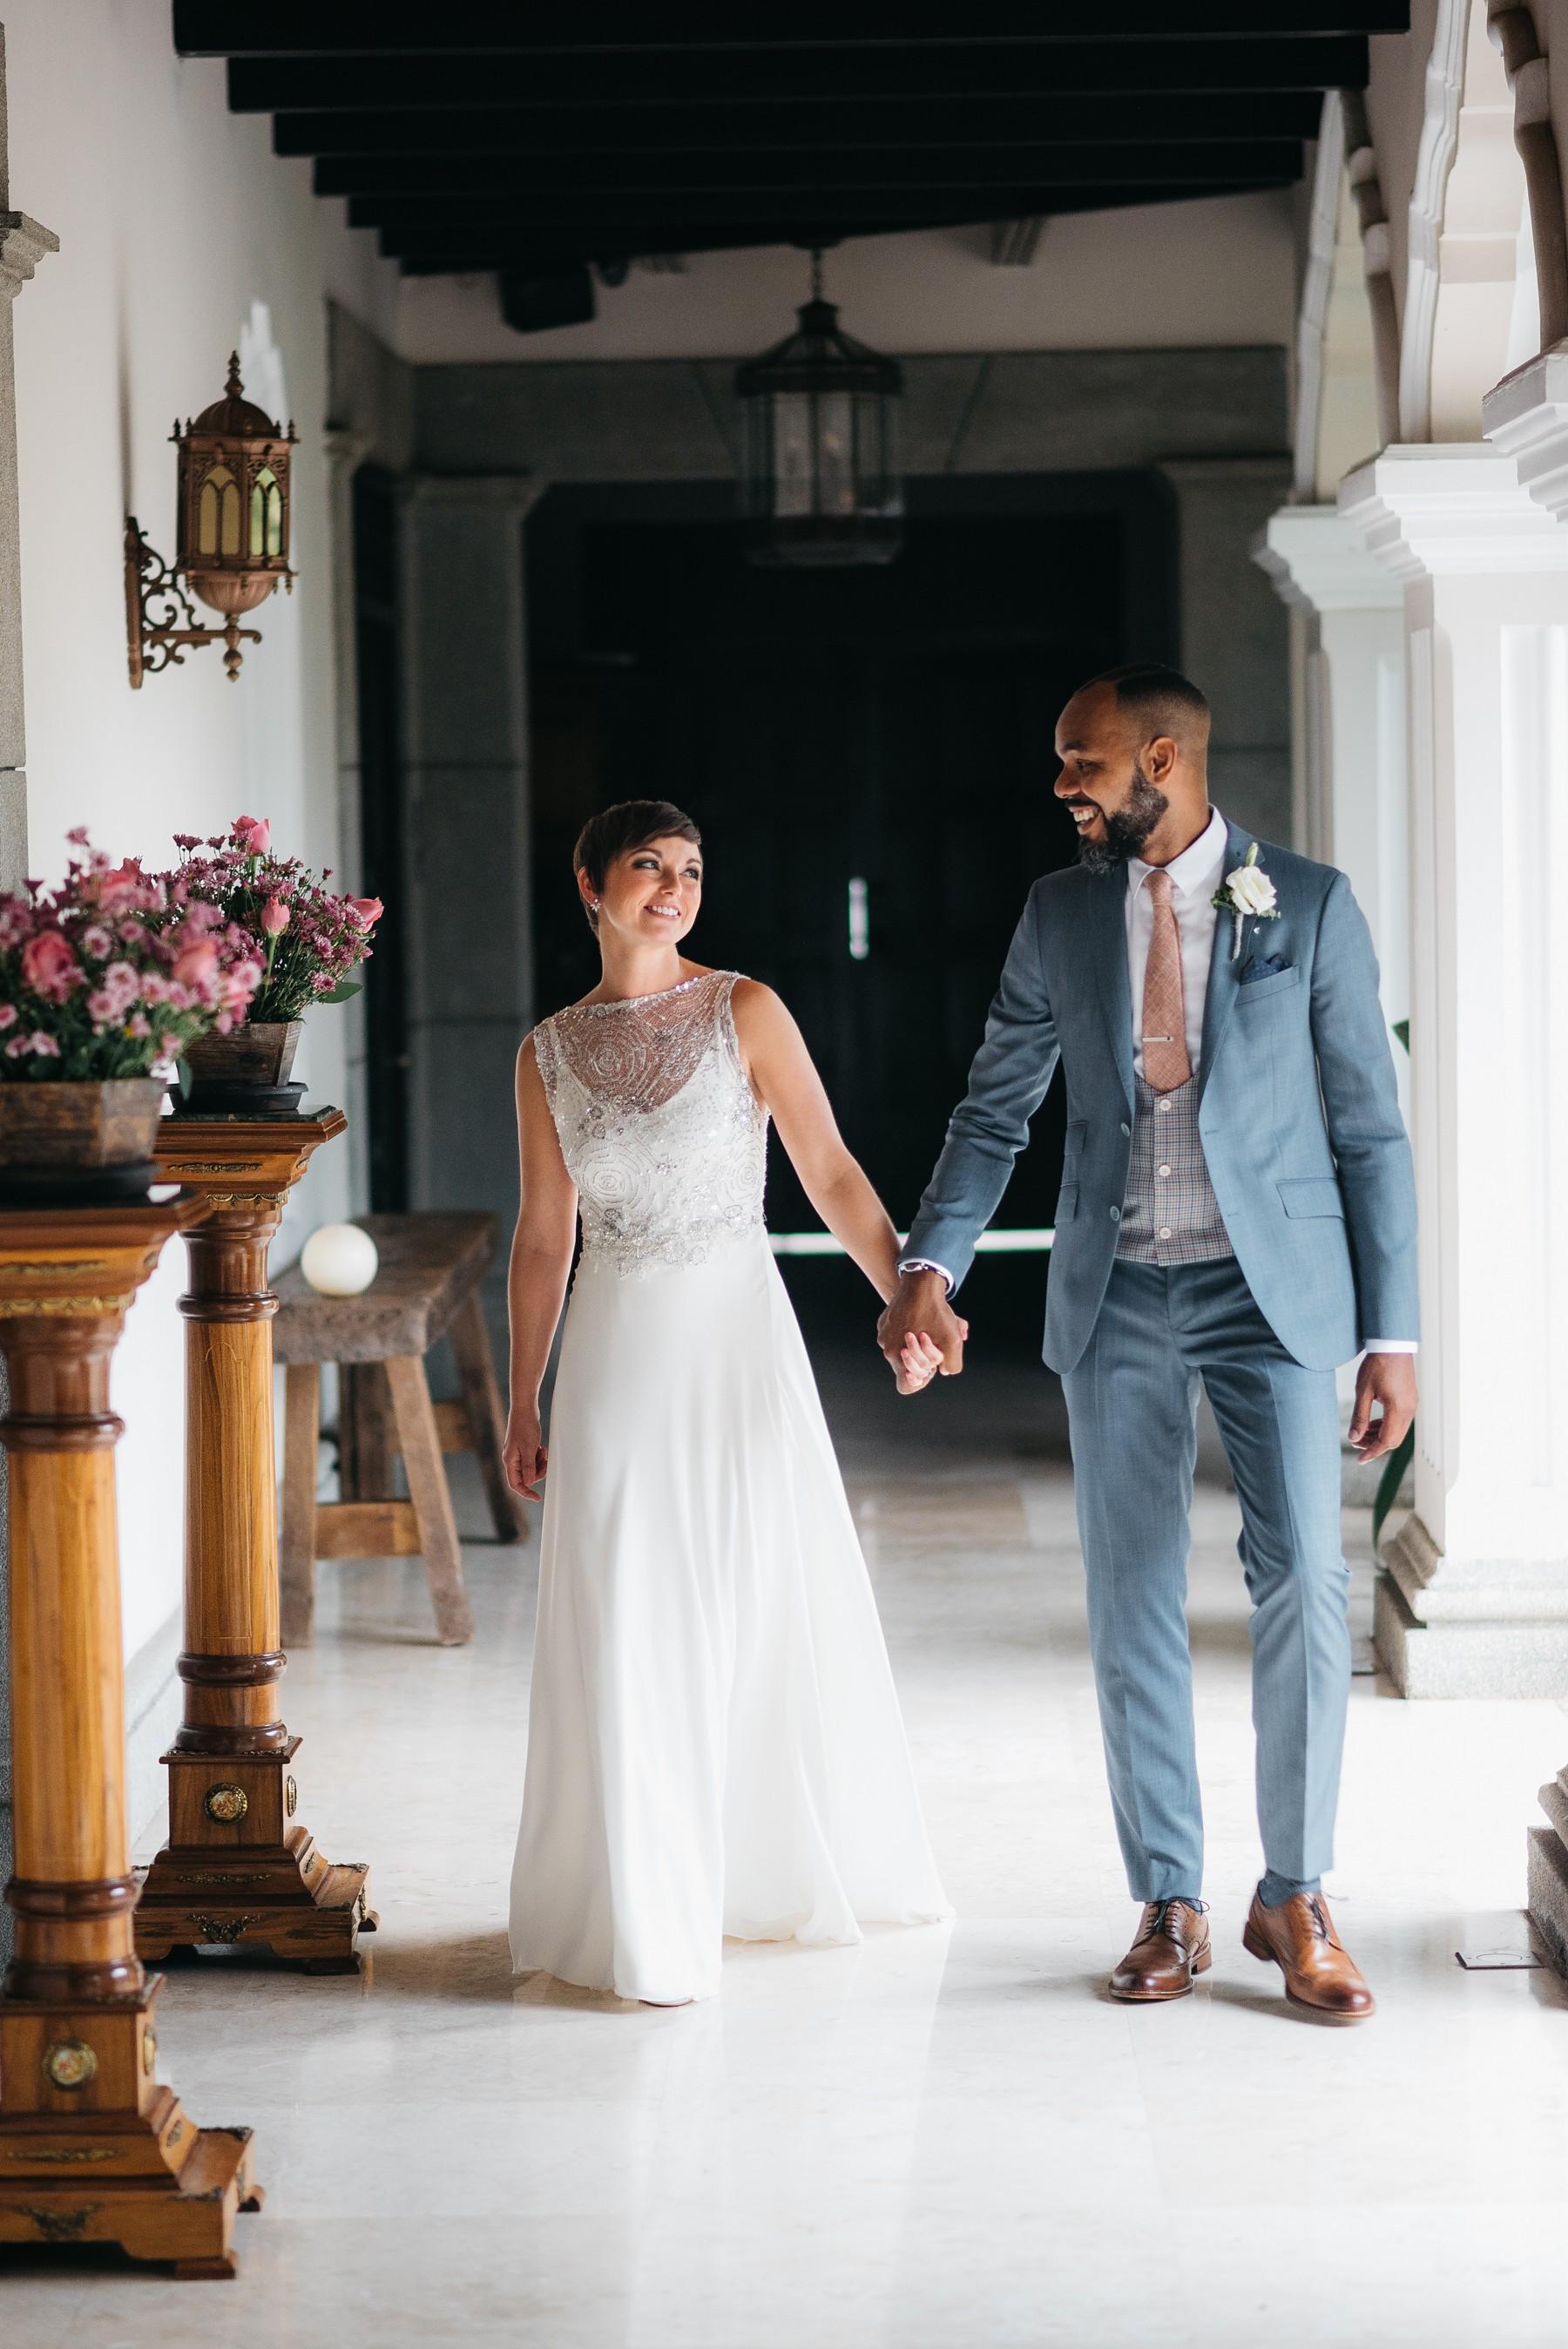 Married couple walking at Pensativo Hotel in Antigua Guatemala